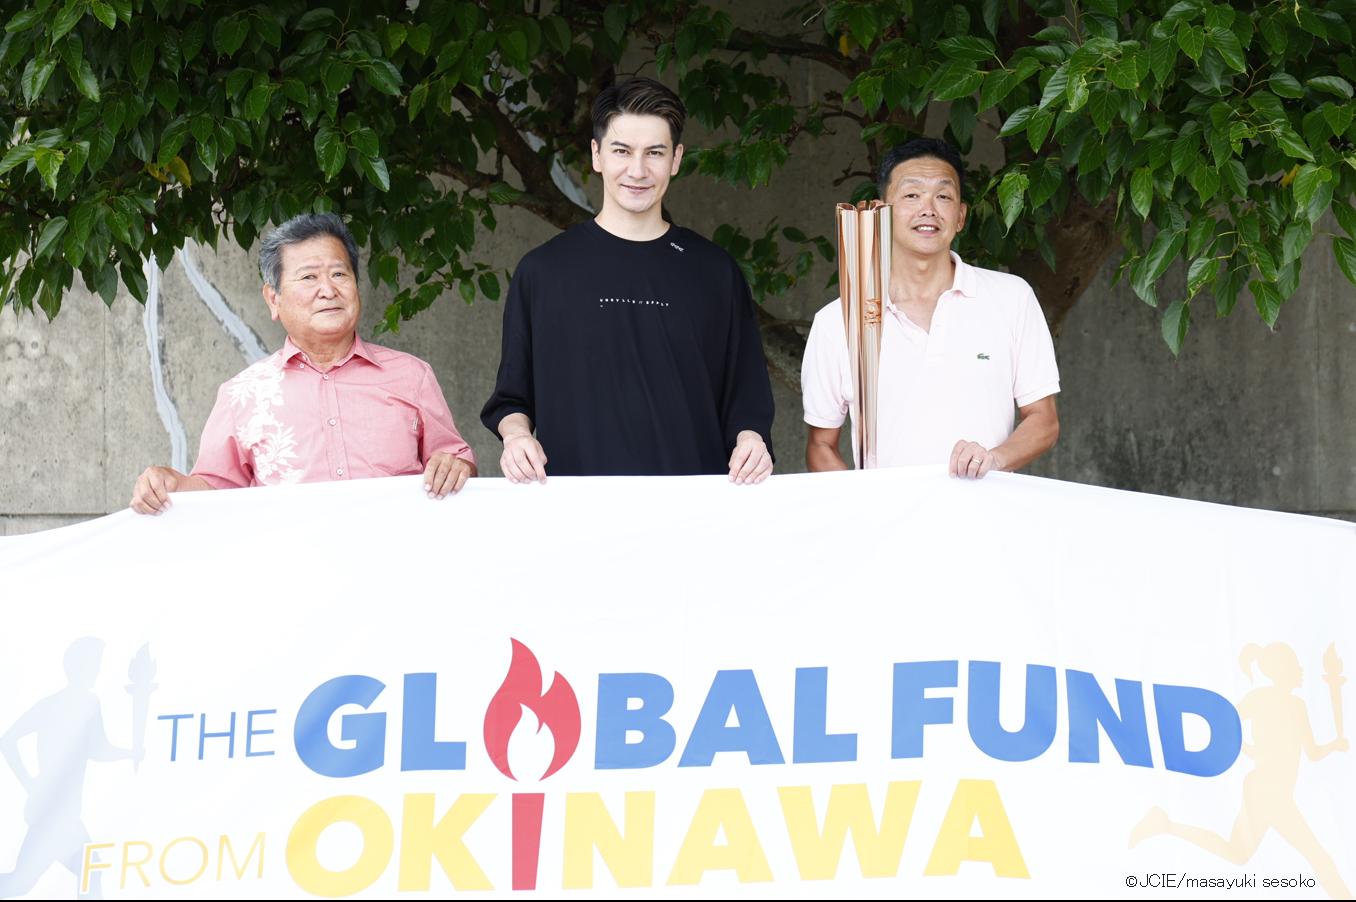 JOYさん、感染症終息への想いと共に、聖火ランナーとして沖縄を走る!